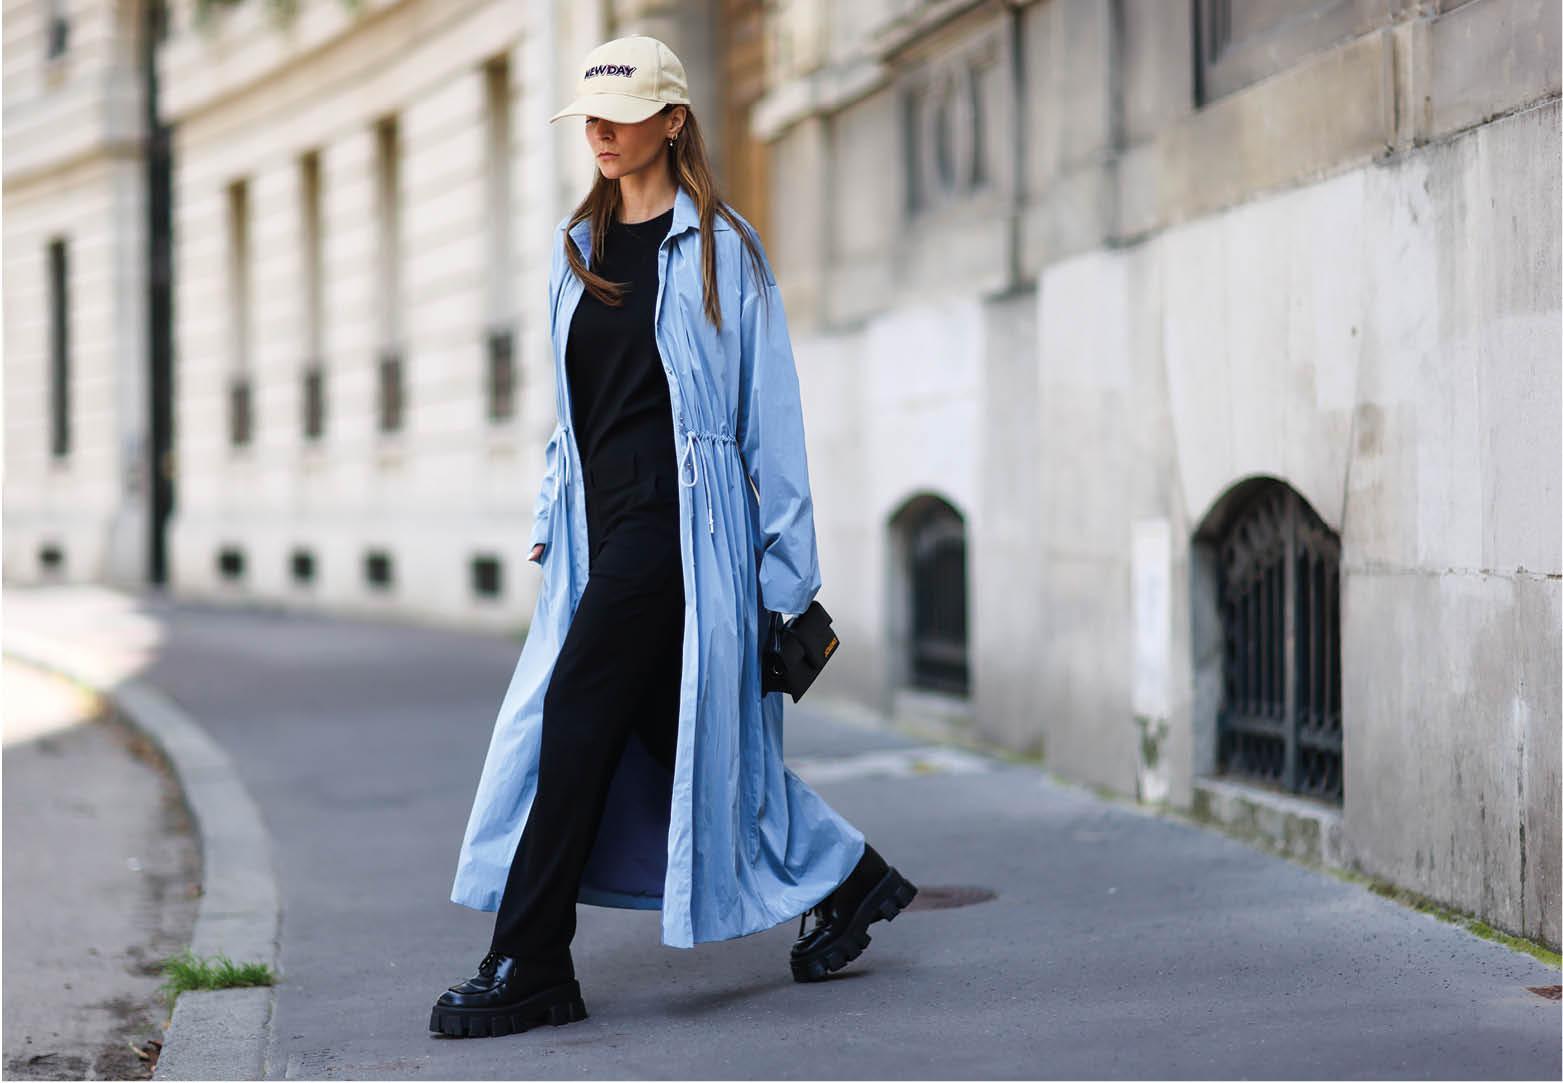 Herfst: Hoe kom je droog en fashionable aan?